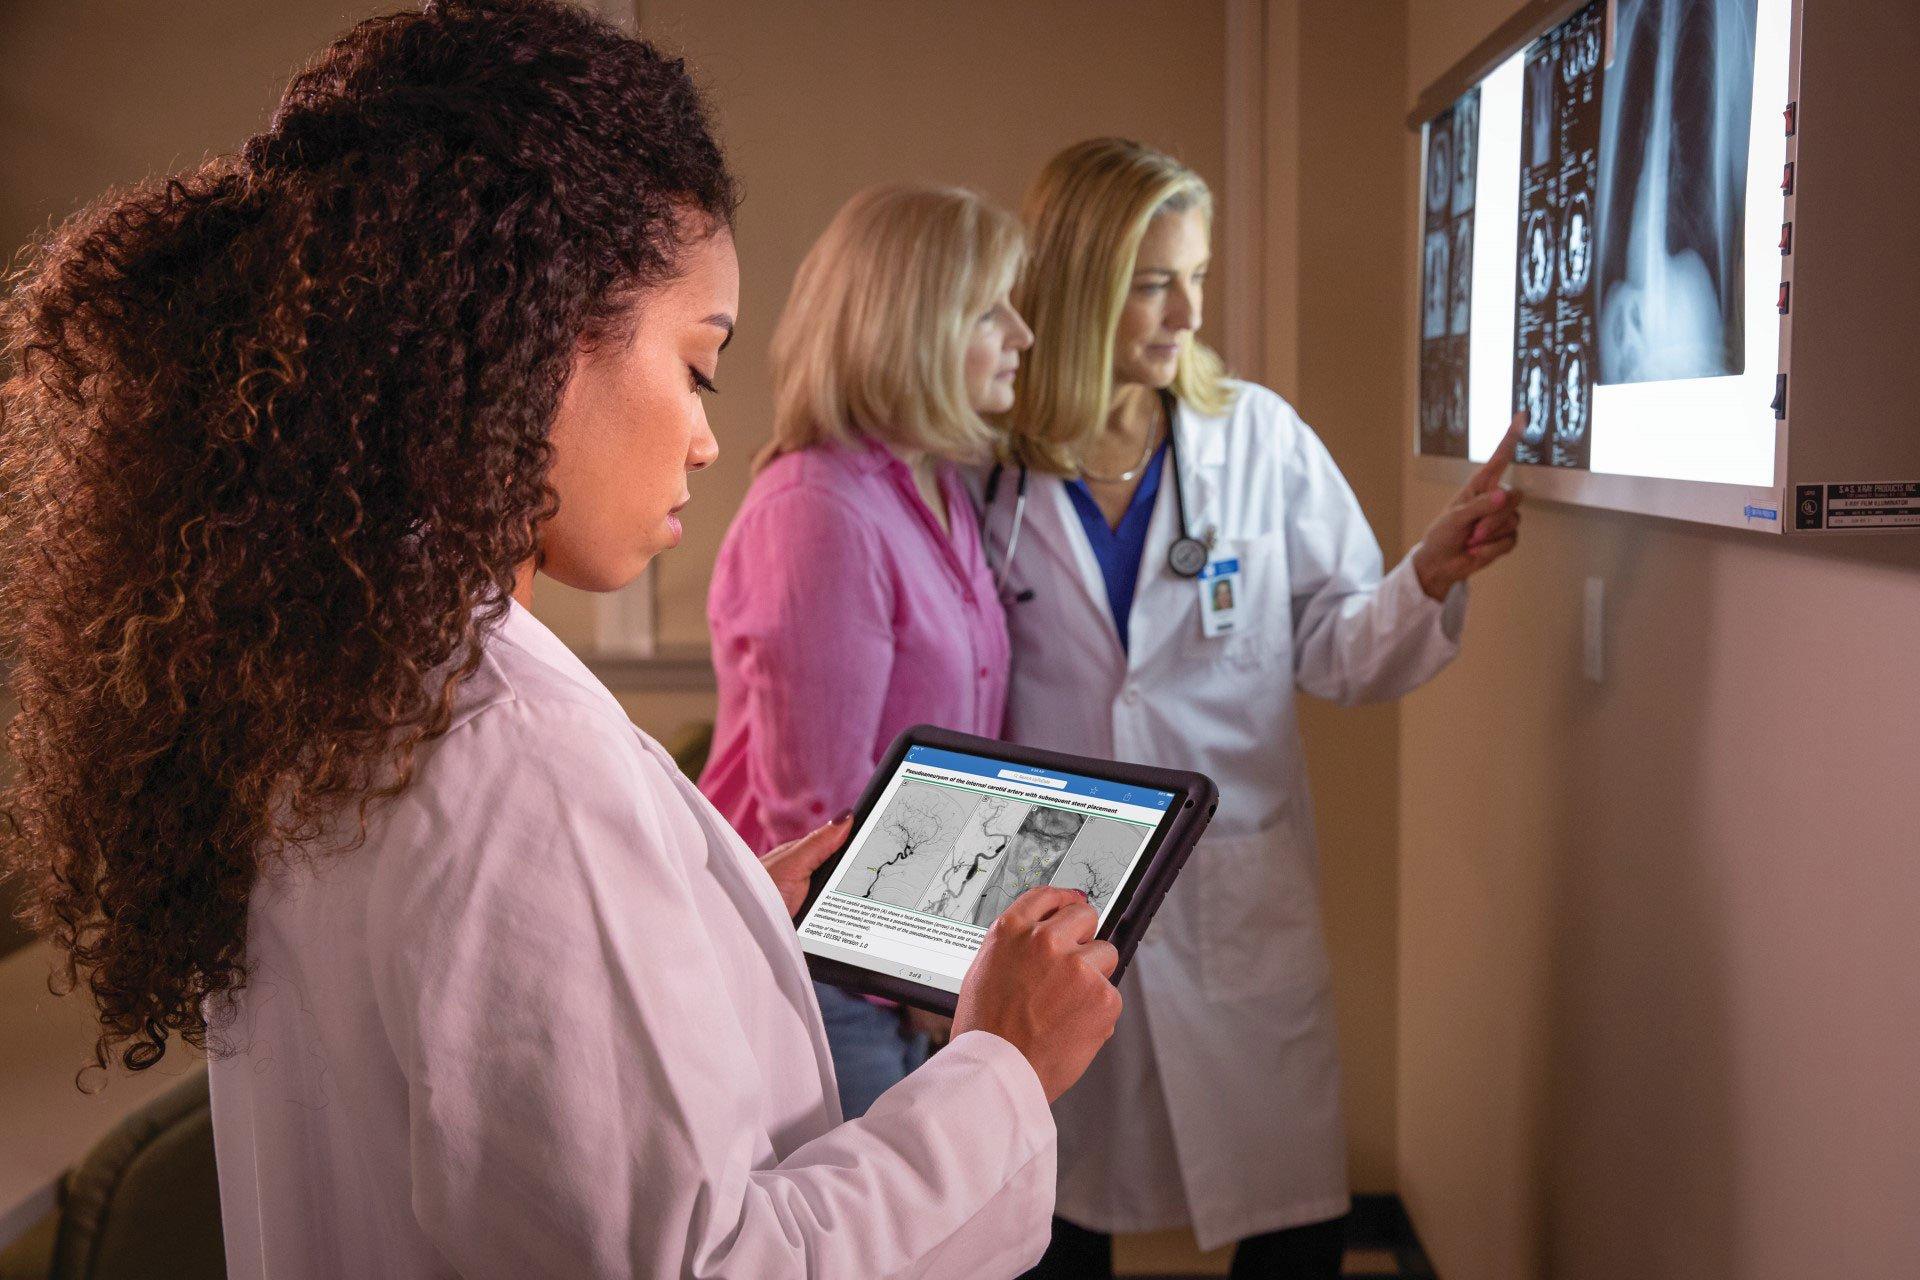 Women doctors diagnosing